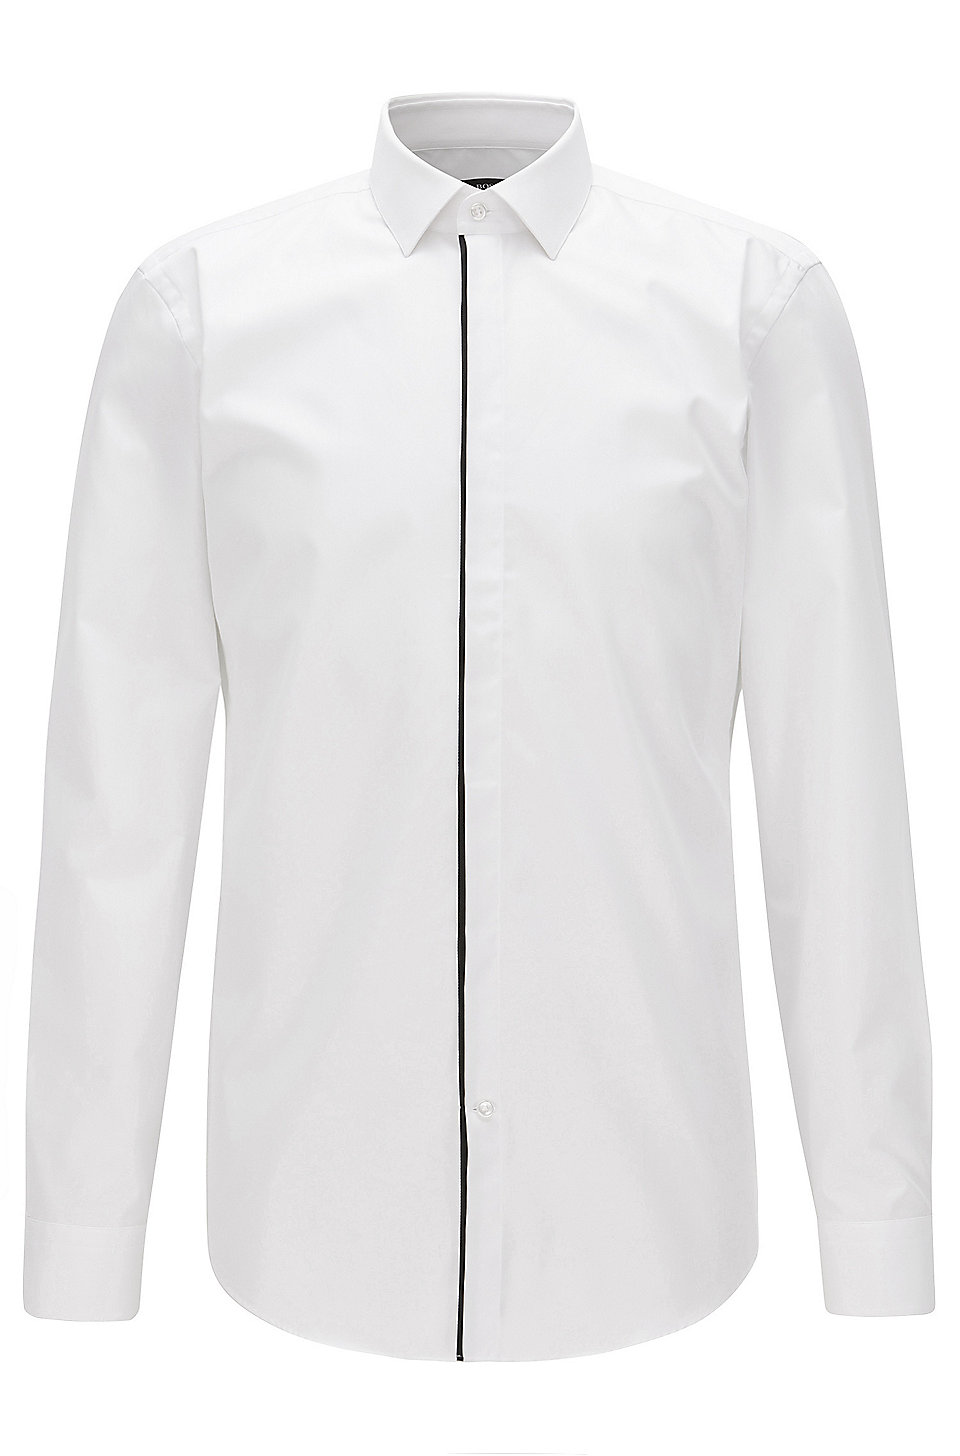 Boss Piped Cotton Dress Shirt Slim Fit Jamis